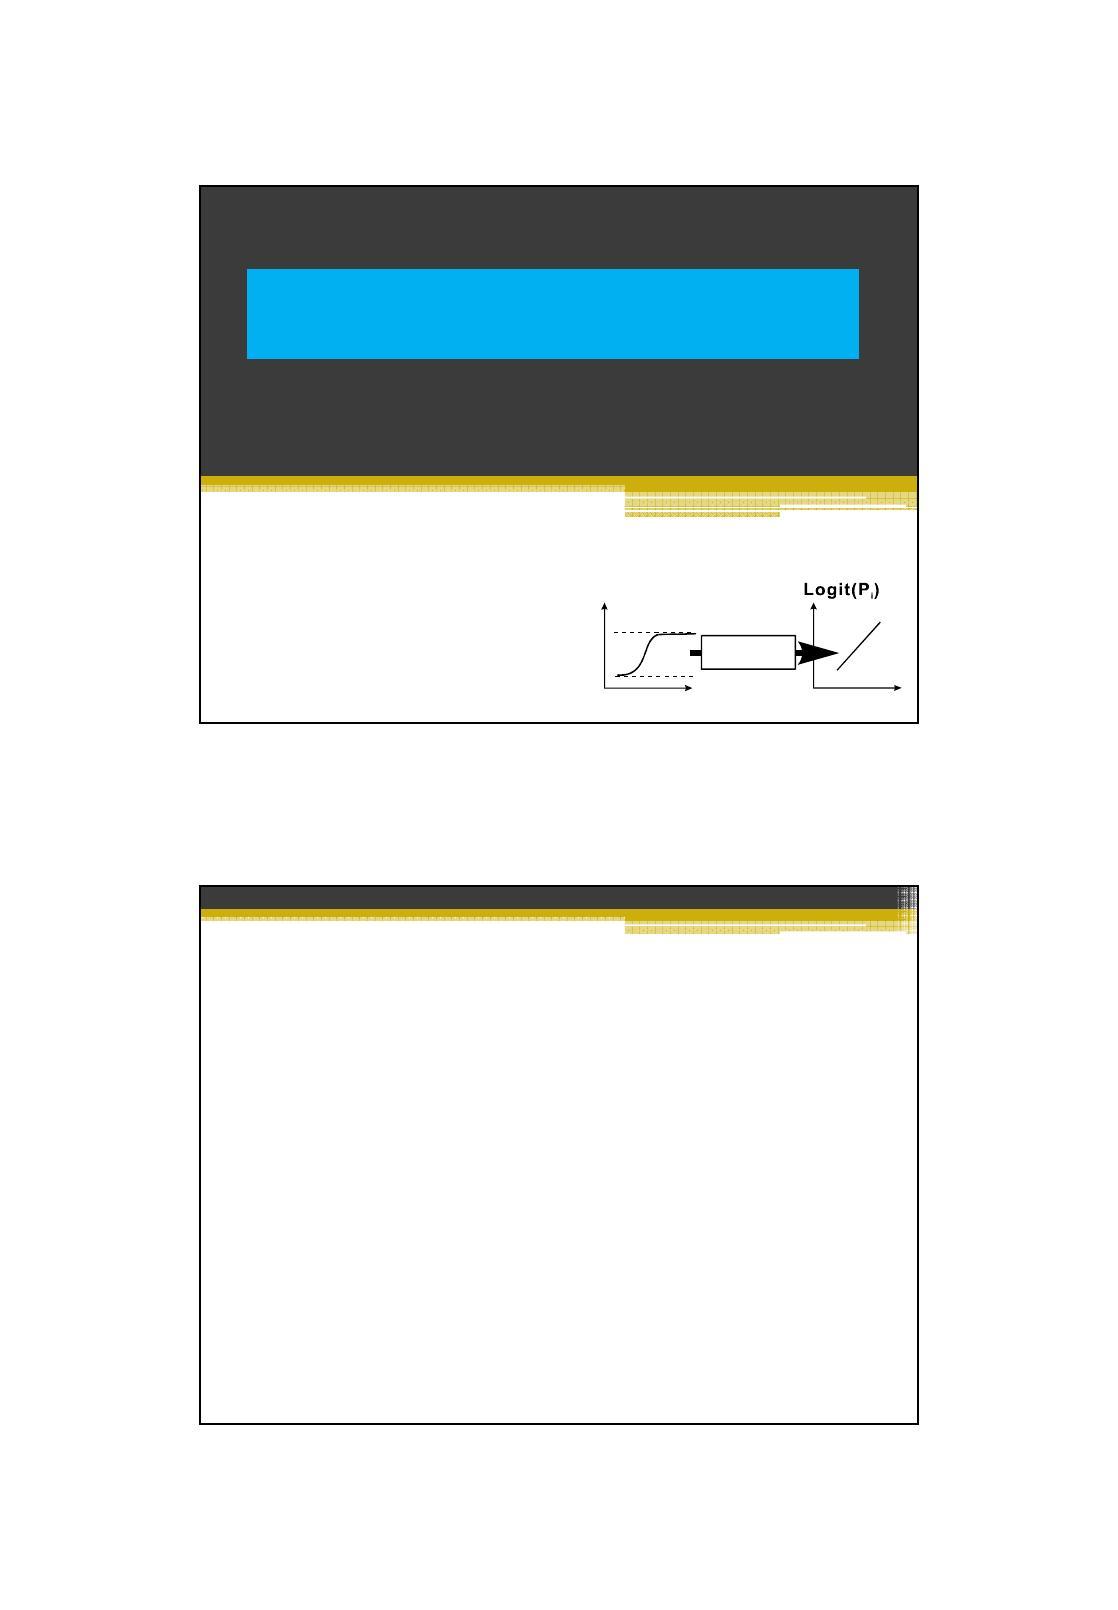 Cara Membaca Output Spss Regresi Logistik : membaca, output, regresi, logistik, Analisis, Regresi, Logistik.pdf, [PDF|TXT]